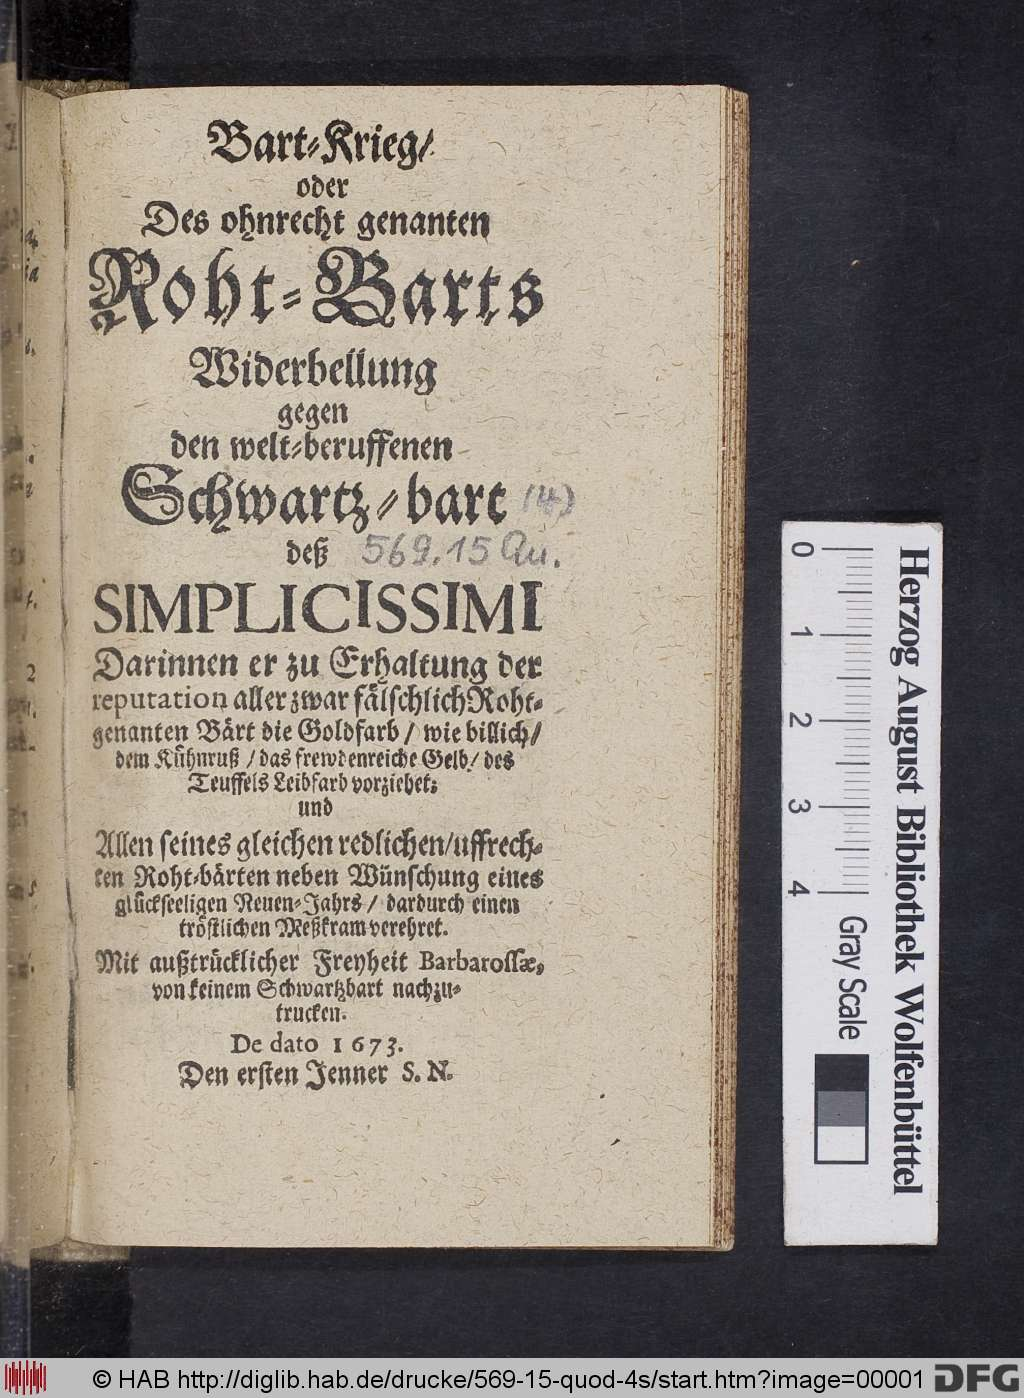 http://diglib.hab.de/drucke/569-15-quod-4s/00001.jpg